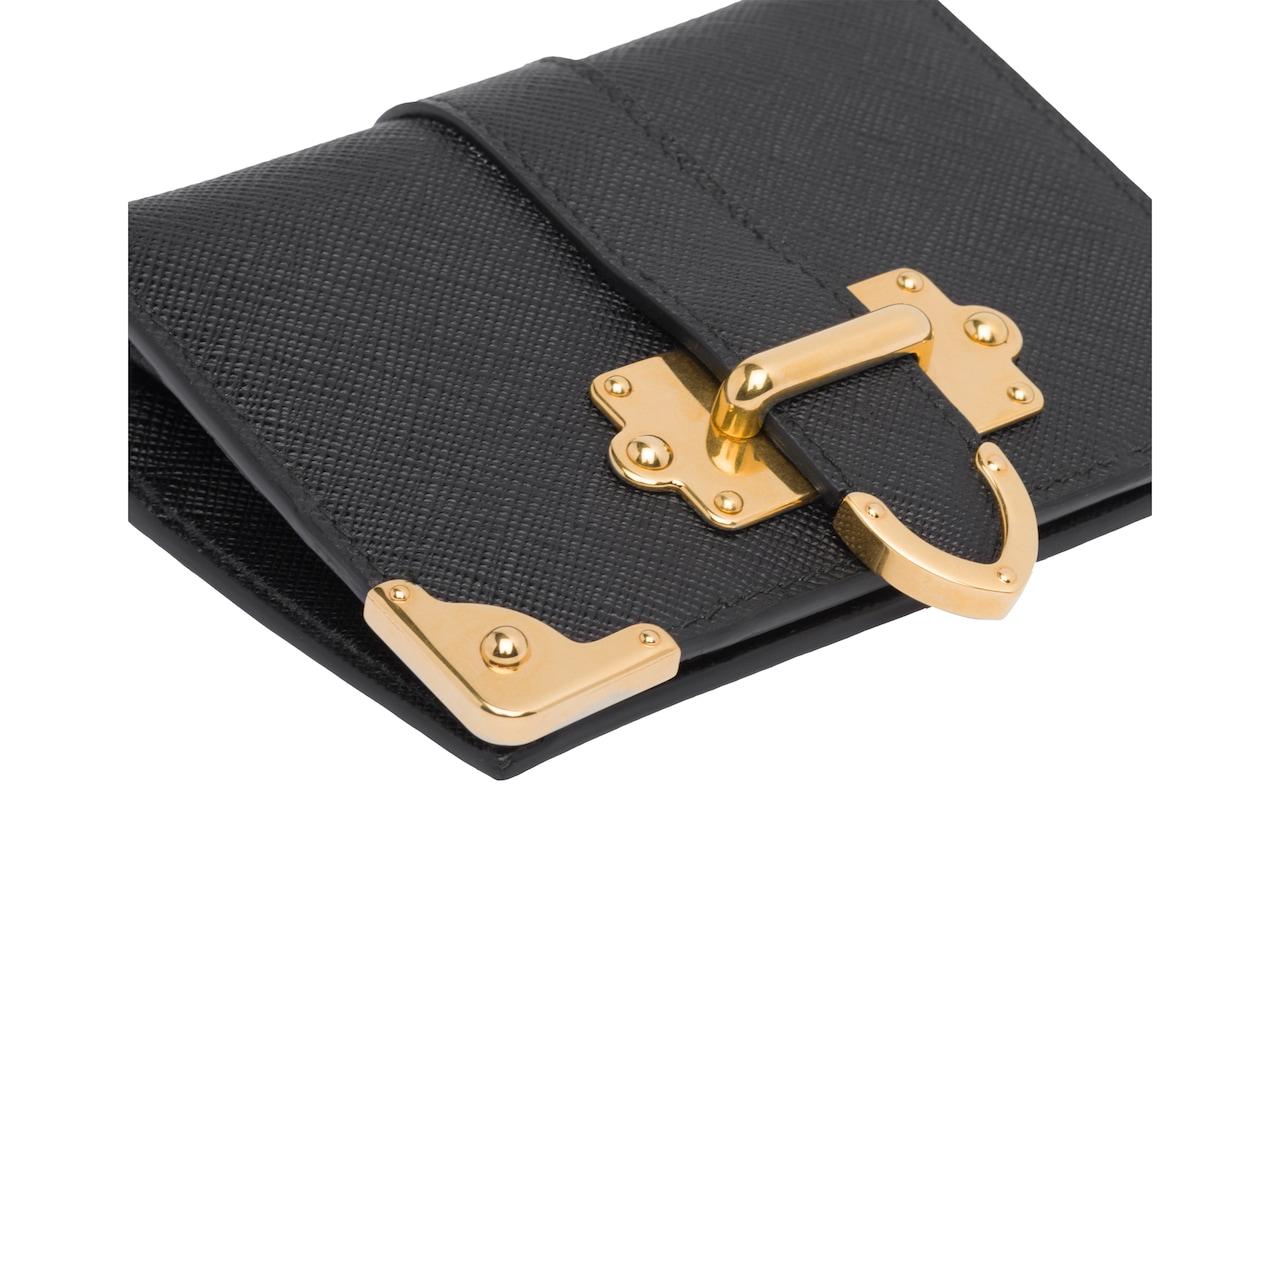 Small Prada Cahier Saffiano leather wallet